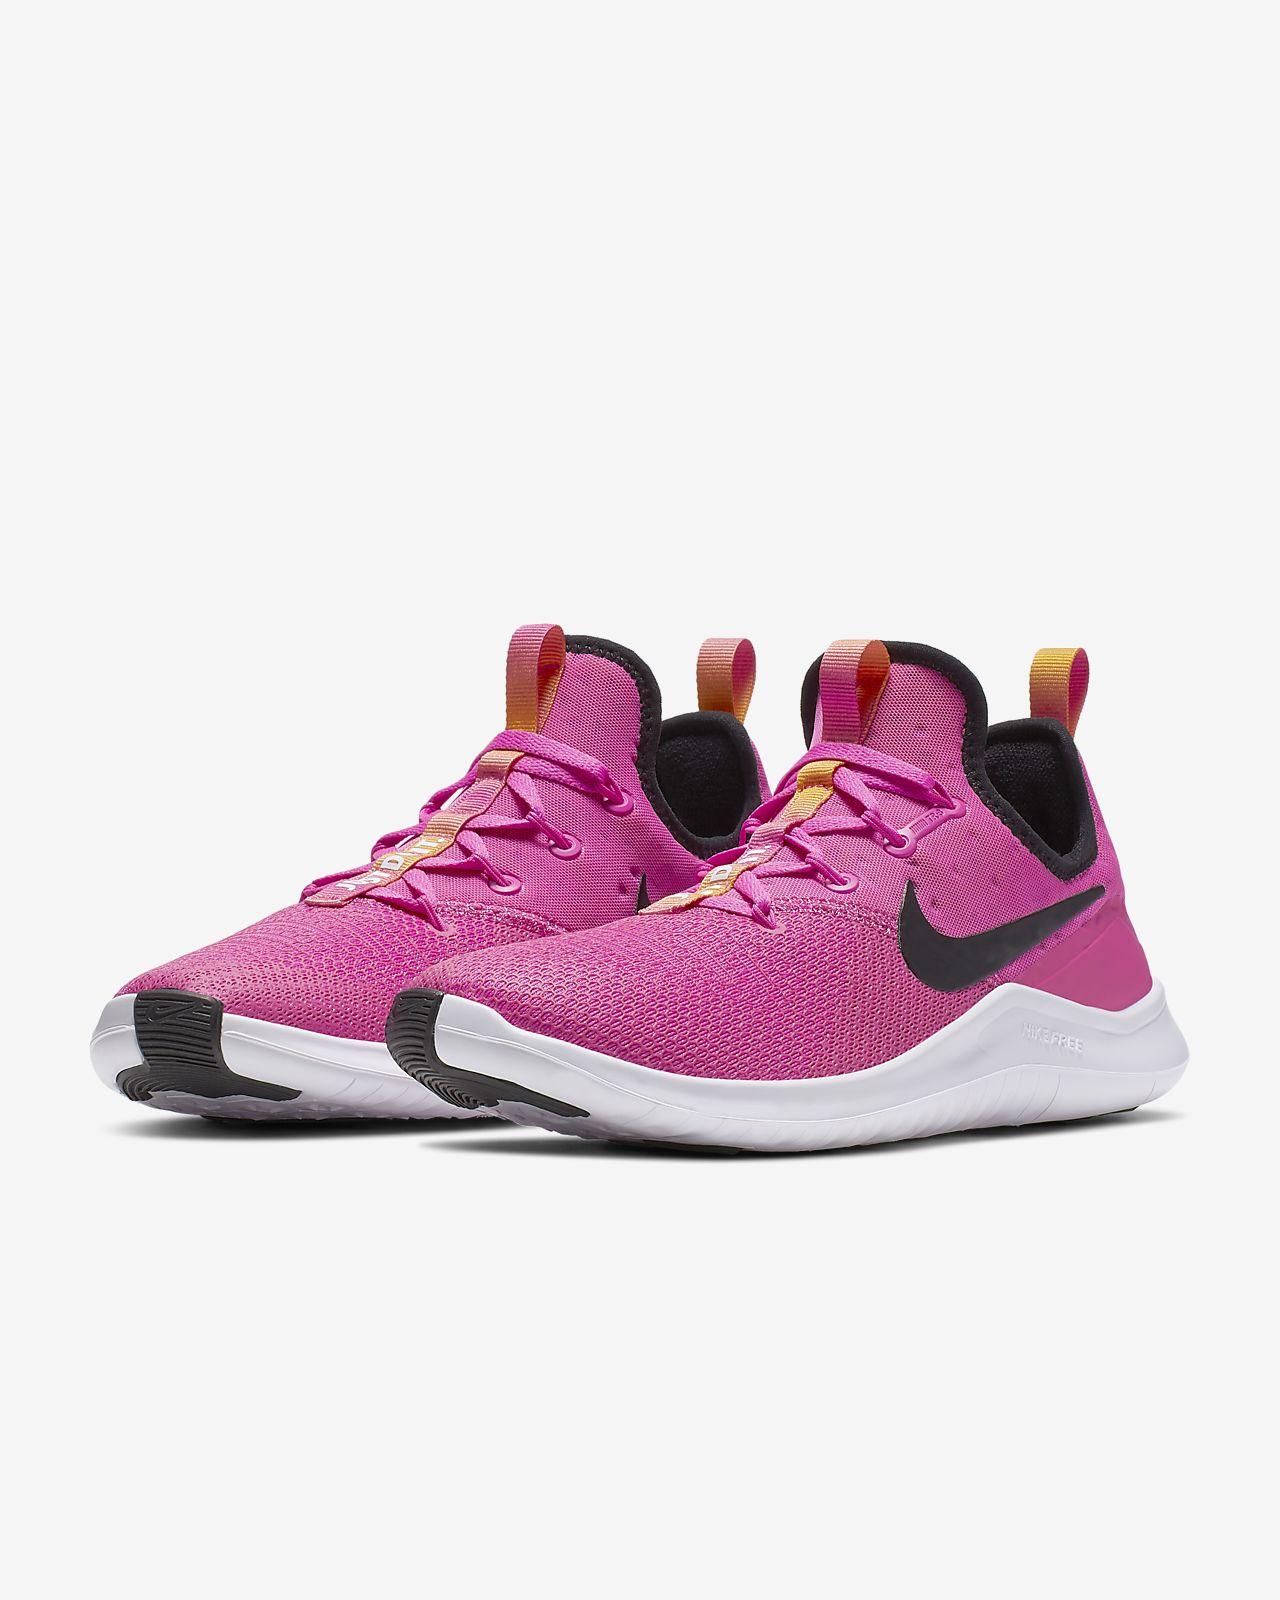 7e646c0b54b2b Nike Free TR8 Women s Gym HIIT Cross Training Shoe. Nike.com